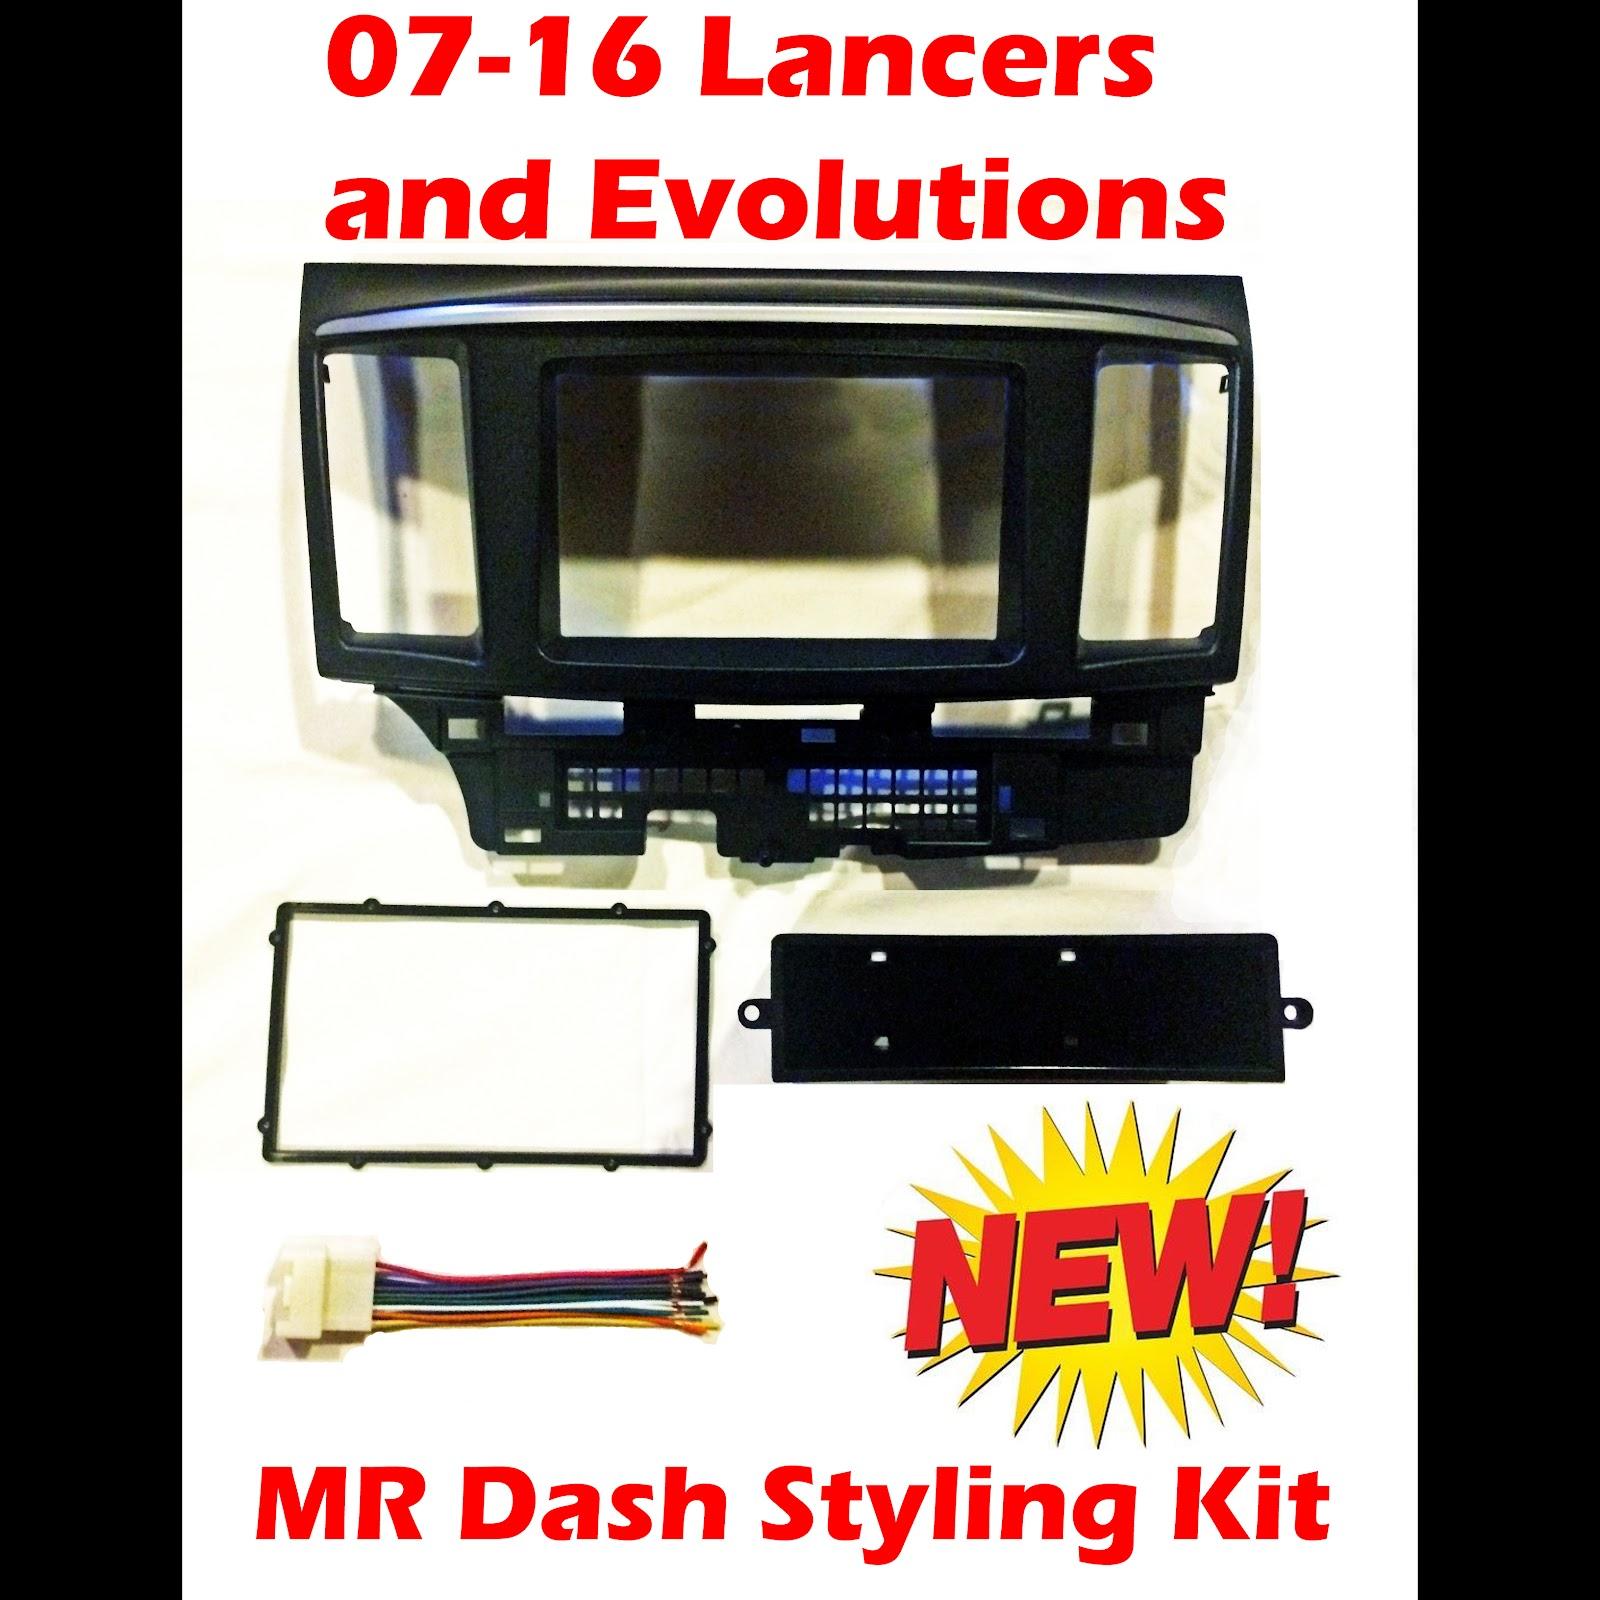 New Metra 99-7011 Single//Double DIN Stereo Dash Kit for 2008 Mitsubishi Lancer